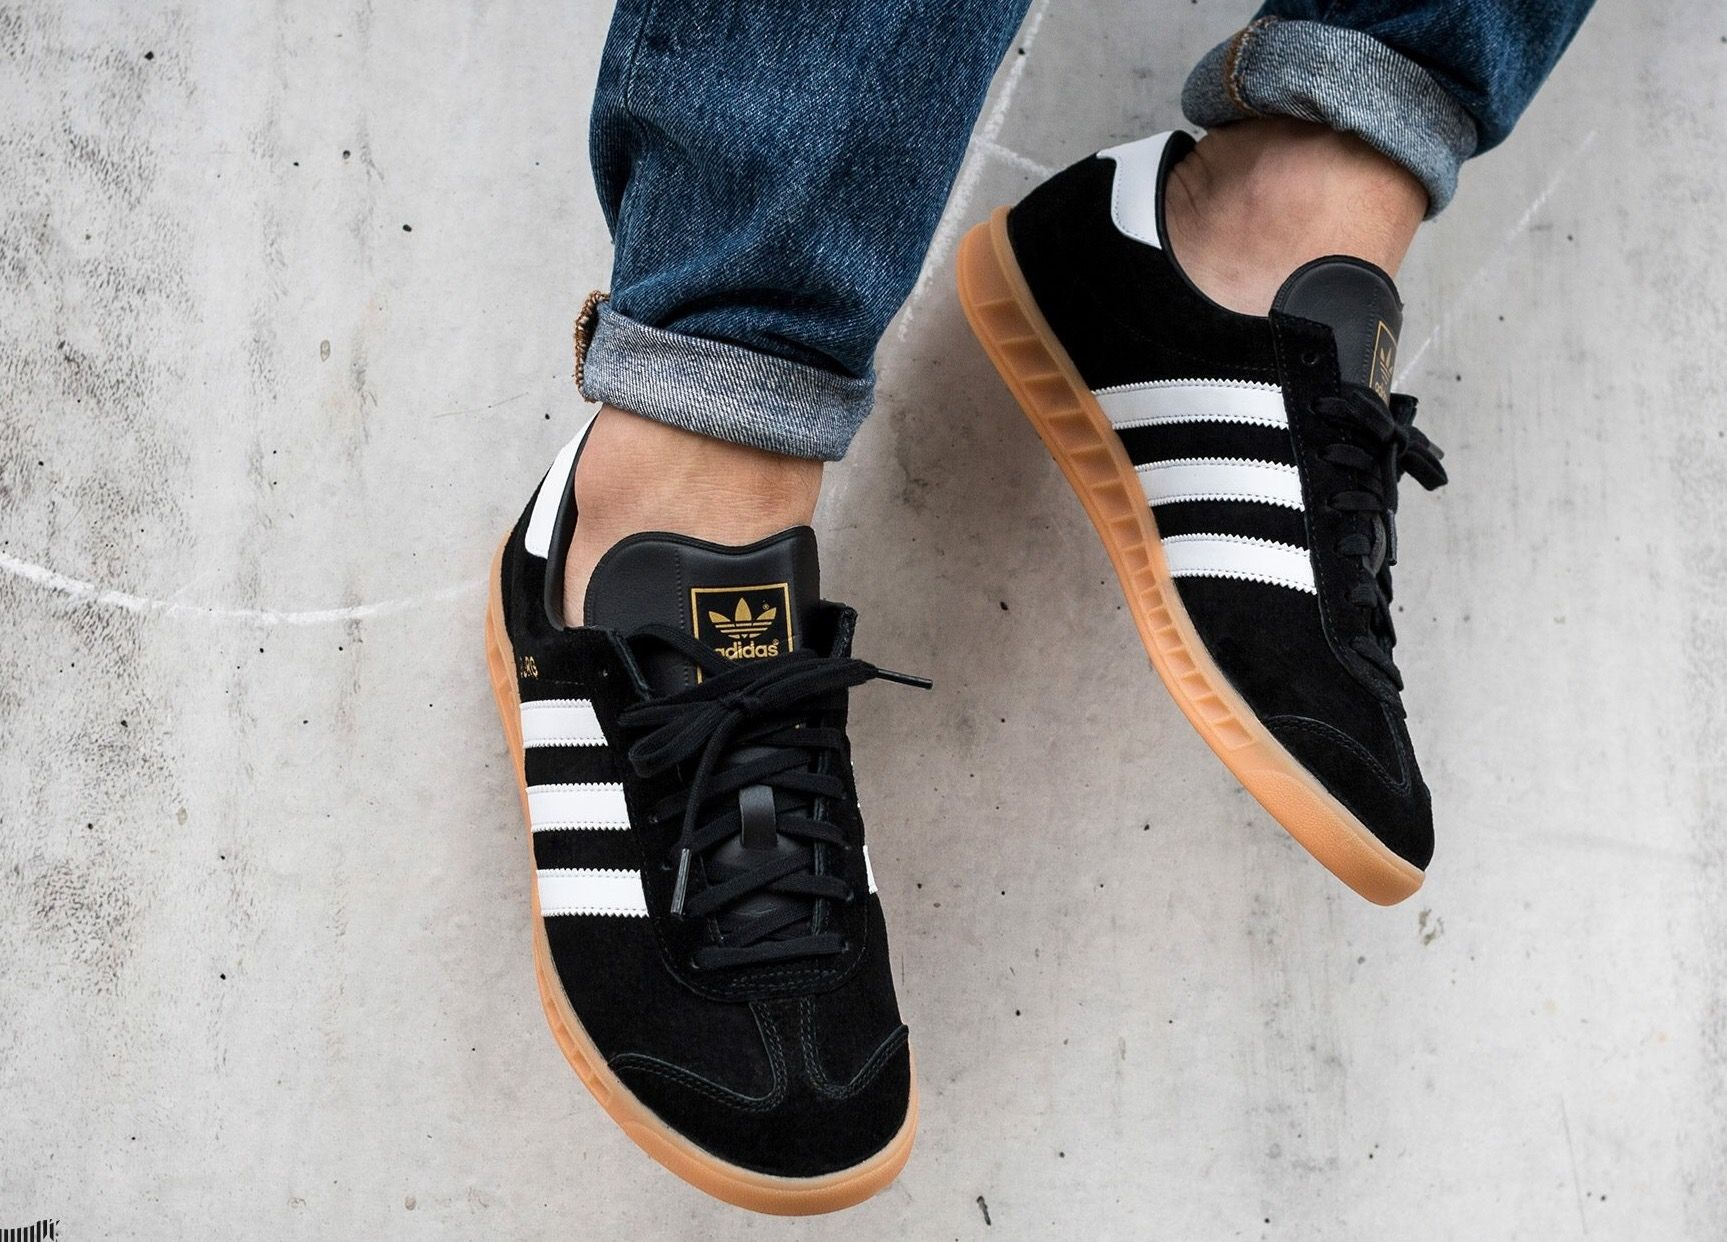 Adidas Hamburg 2017